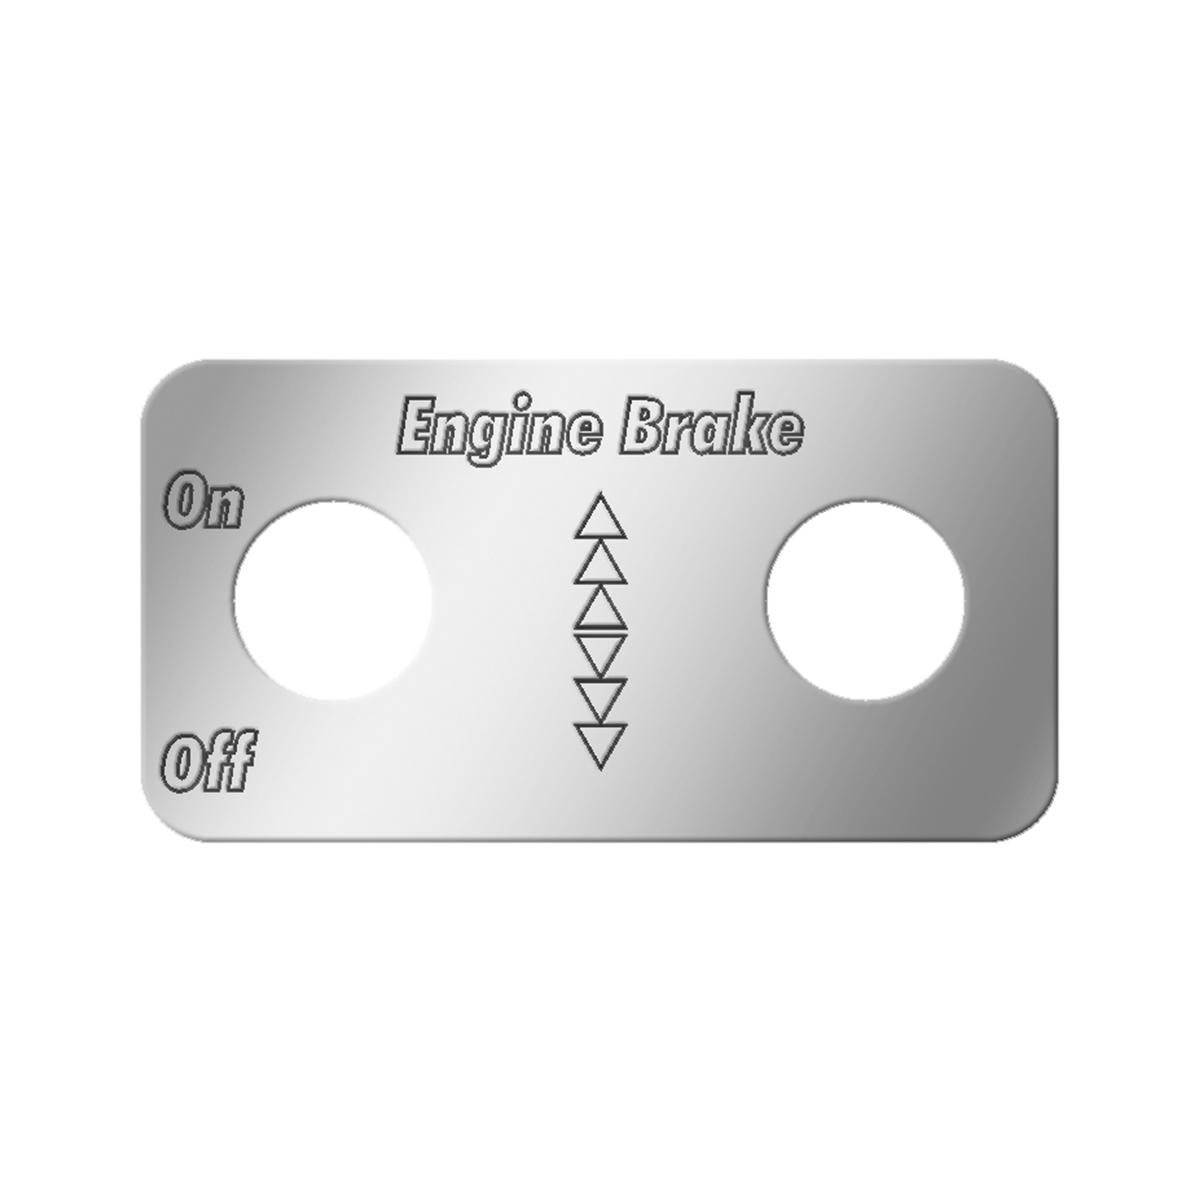 #68571 - Engine Brake - Arrow